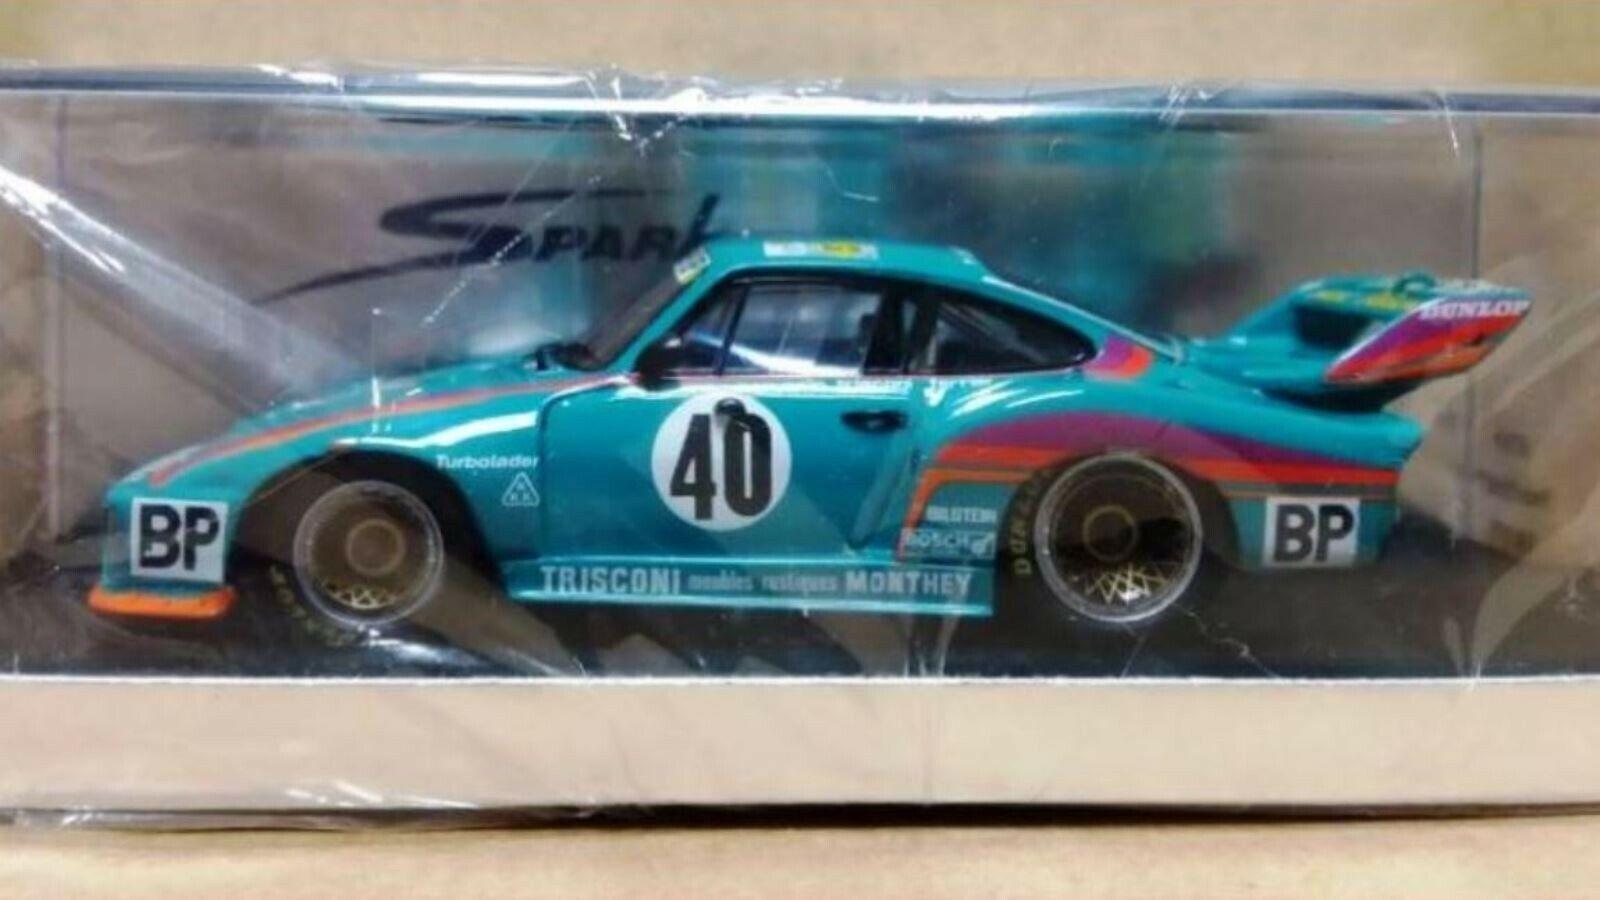 Wow EXTRÊMEMENT RARE PORSCHE 935 1979 Turbo  40 BP 3rd 24 H DU MANS resin 1 43 Spark